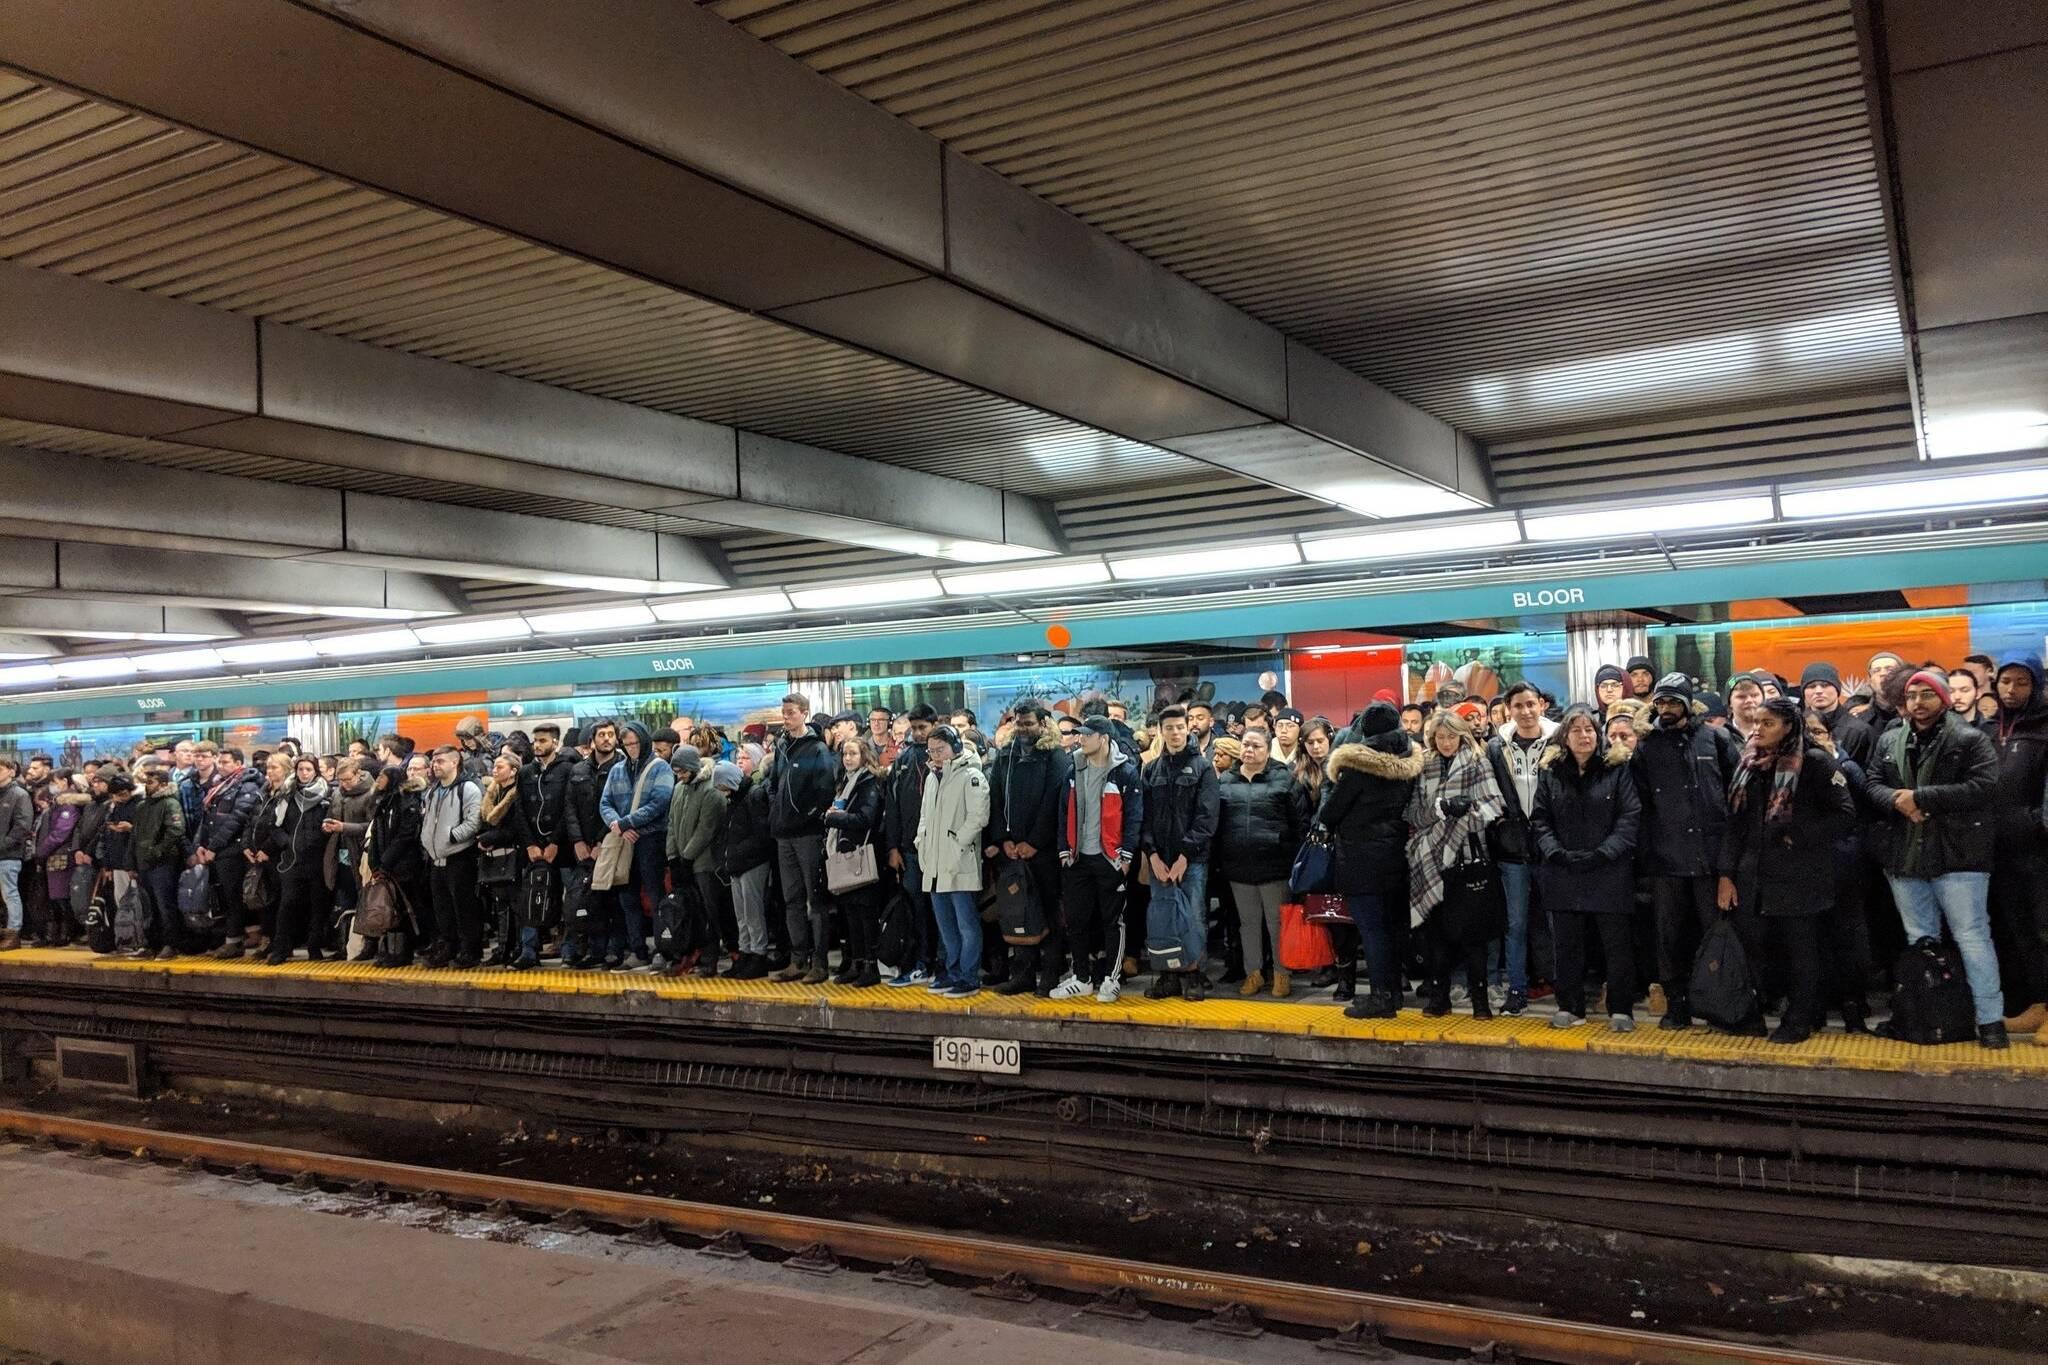 toronto bloor yonge station